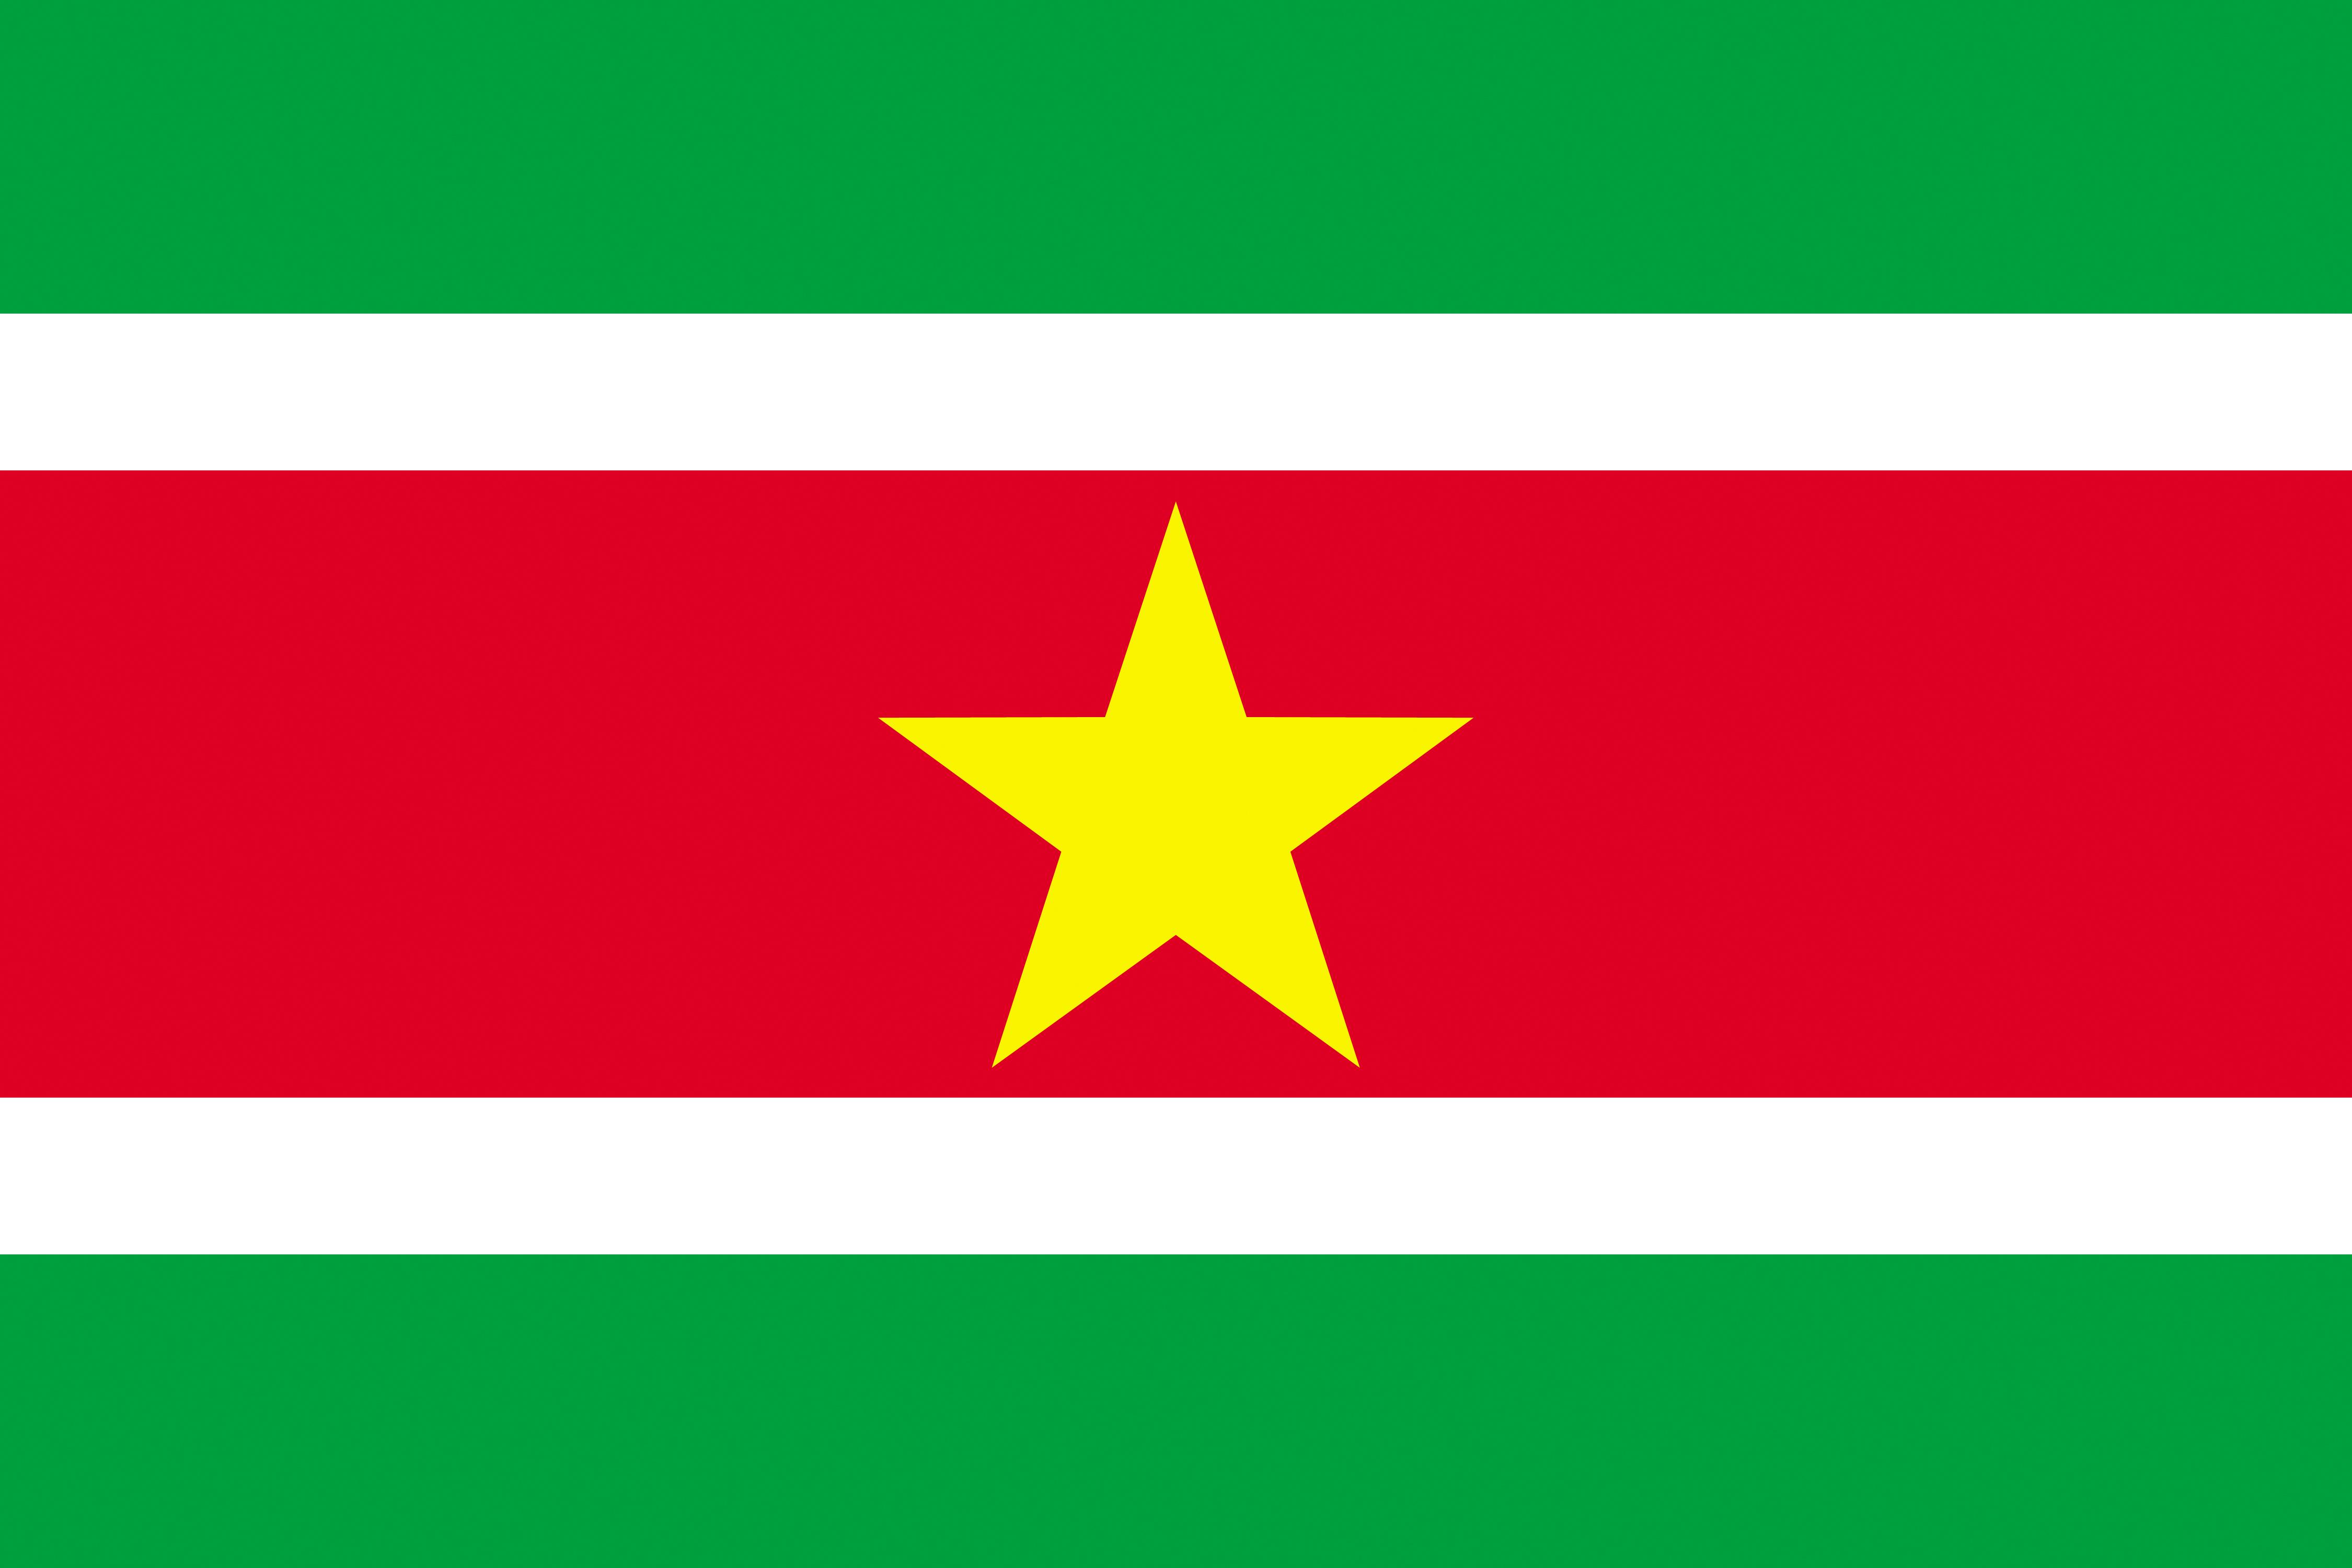 Picture Suriname Flag Stripes 4500x3000 4500x3000